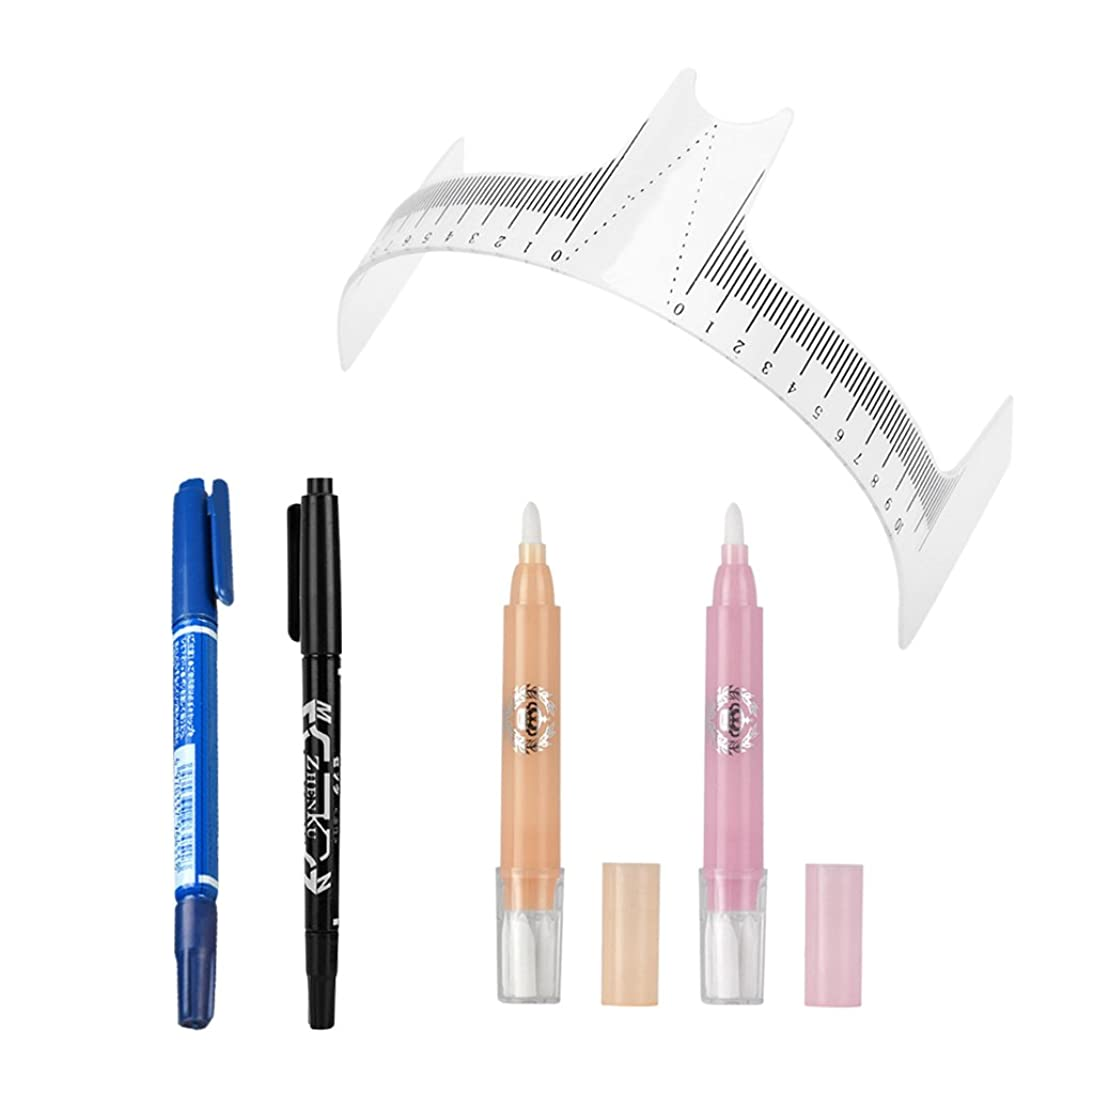 SM SunniMix 2pcs Black/Blue Oily Marking Pen Scribe Tools, 2pcs Magic Eraser Pens Skin Mark Remover, Eyebrow Stencil Ruler Caliper Kit for Tattoo Piercing Permanent Makeup - 4# hojr270676374238